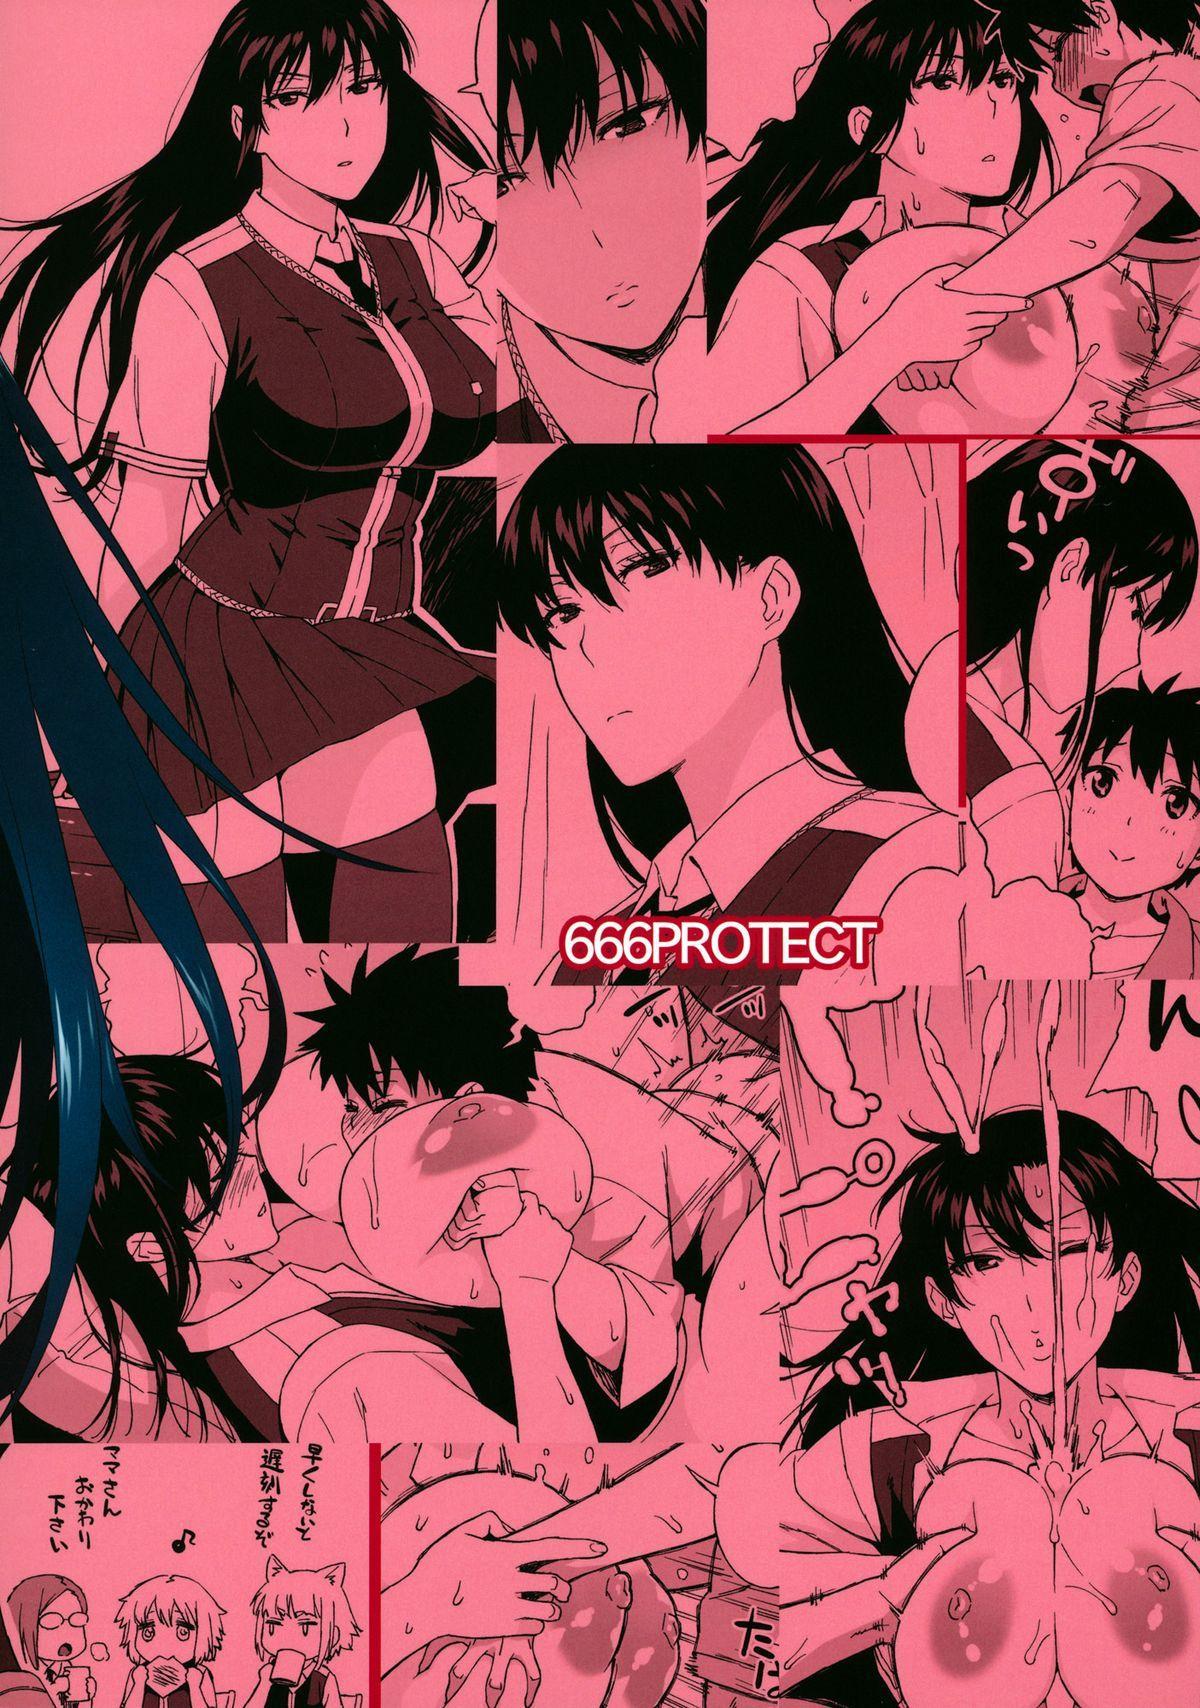 (C84) [666protect (Jingrock)] Doushichattano? Kagari-san | What Did I Do, Kagari-san? (Witch Craft Works) [English] {doujin-moe.us} 25